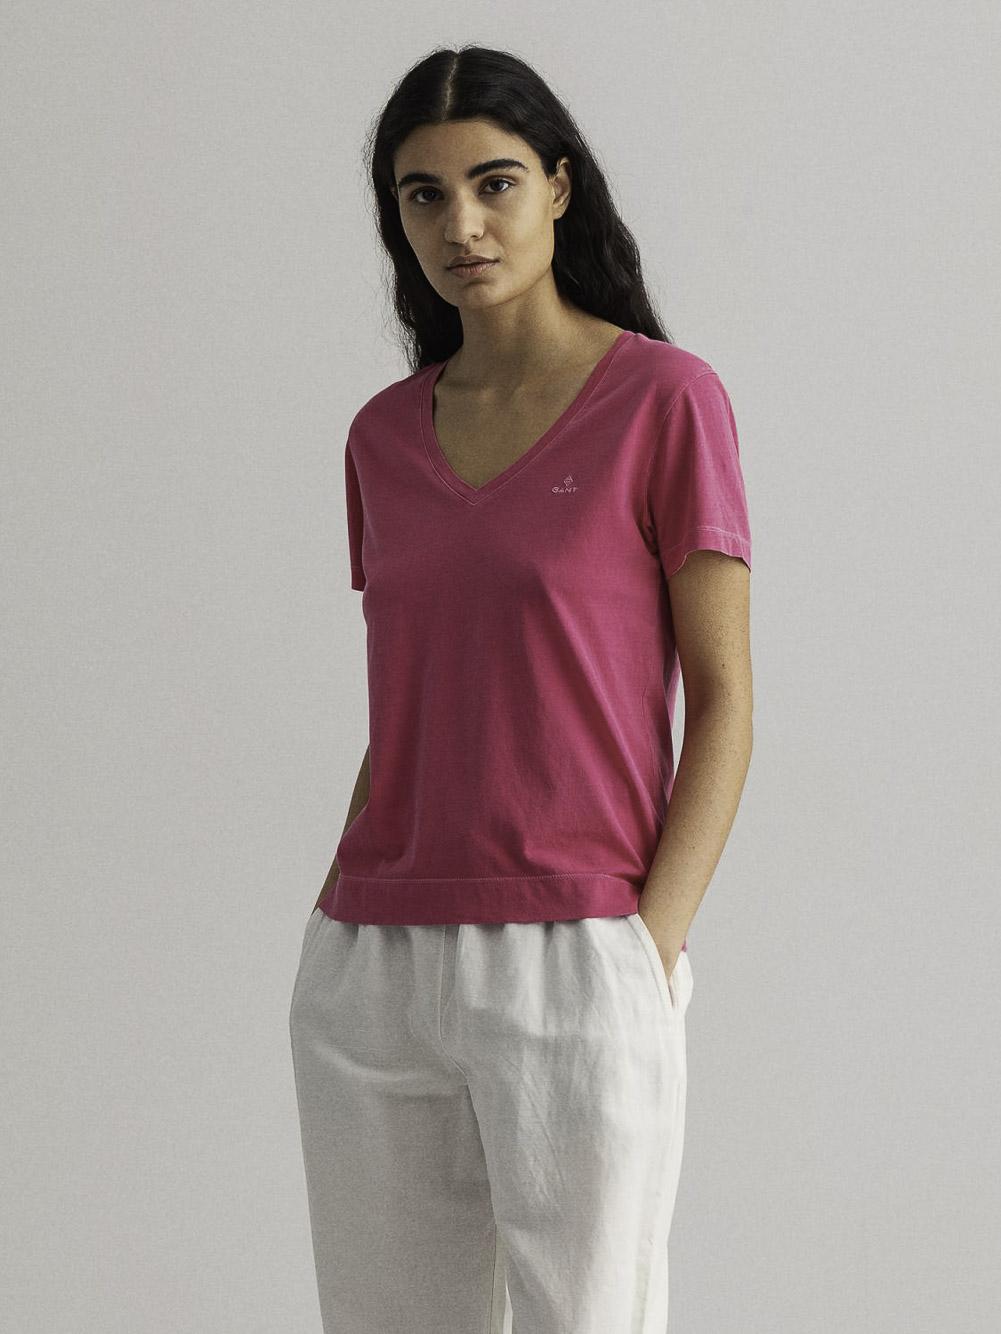 GANT Μπλούζα t-shirt 3GW4203468-673 ΣΚΟΥΡΟ ΦΟΥΞΙΑ